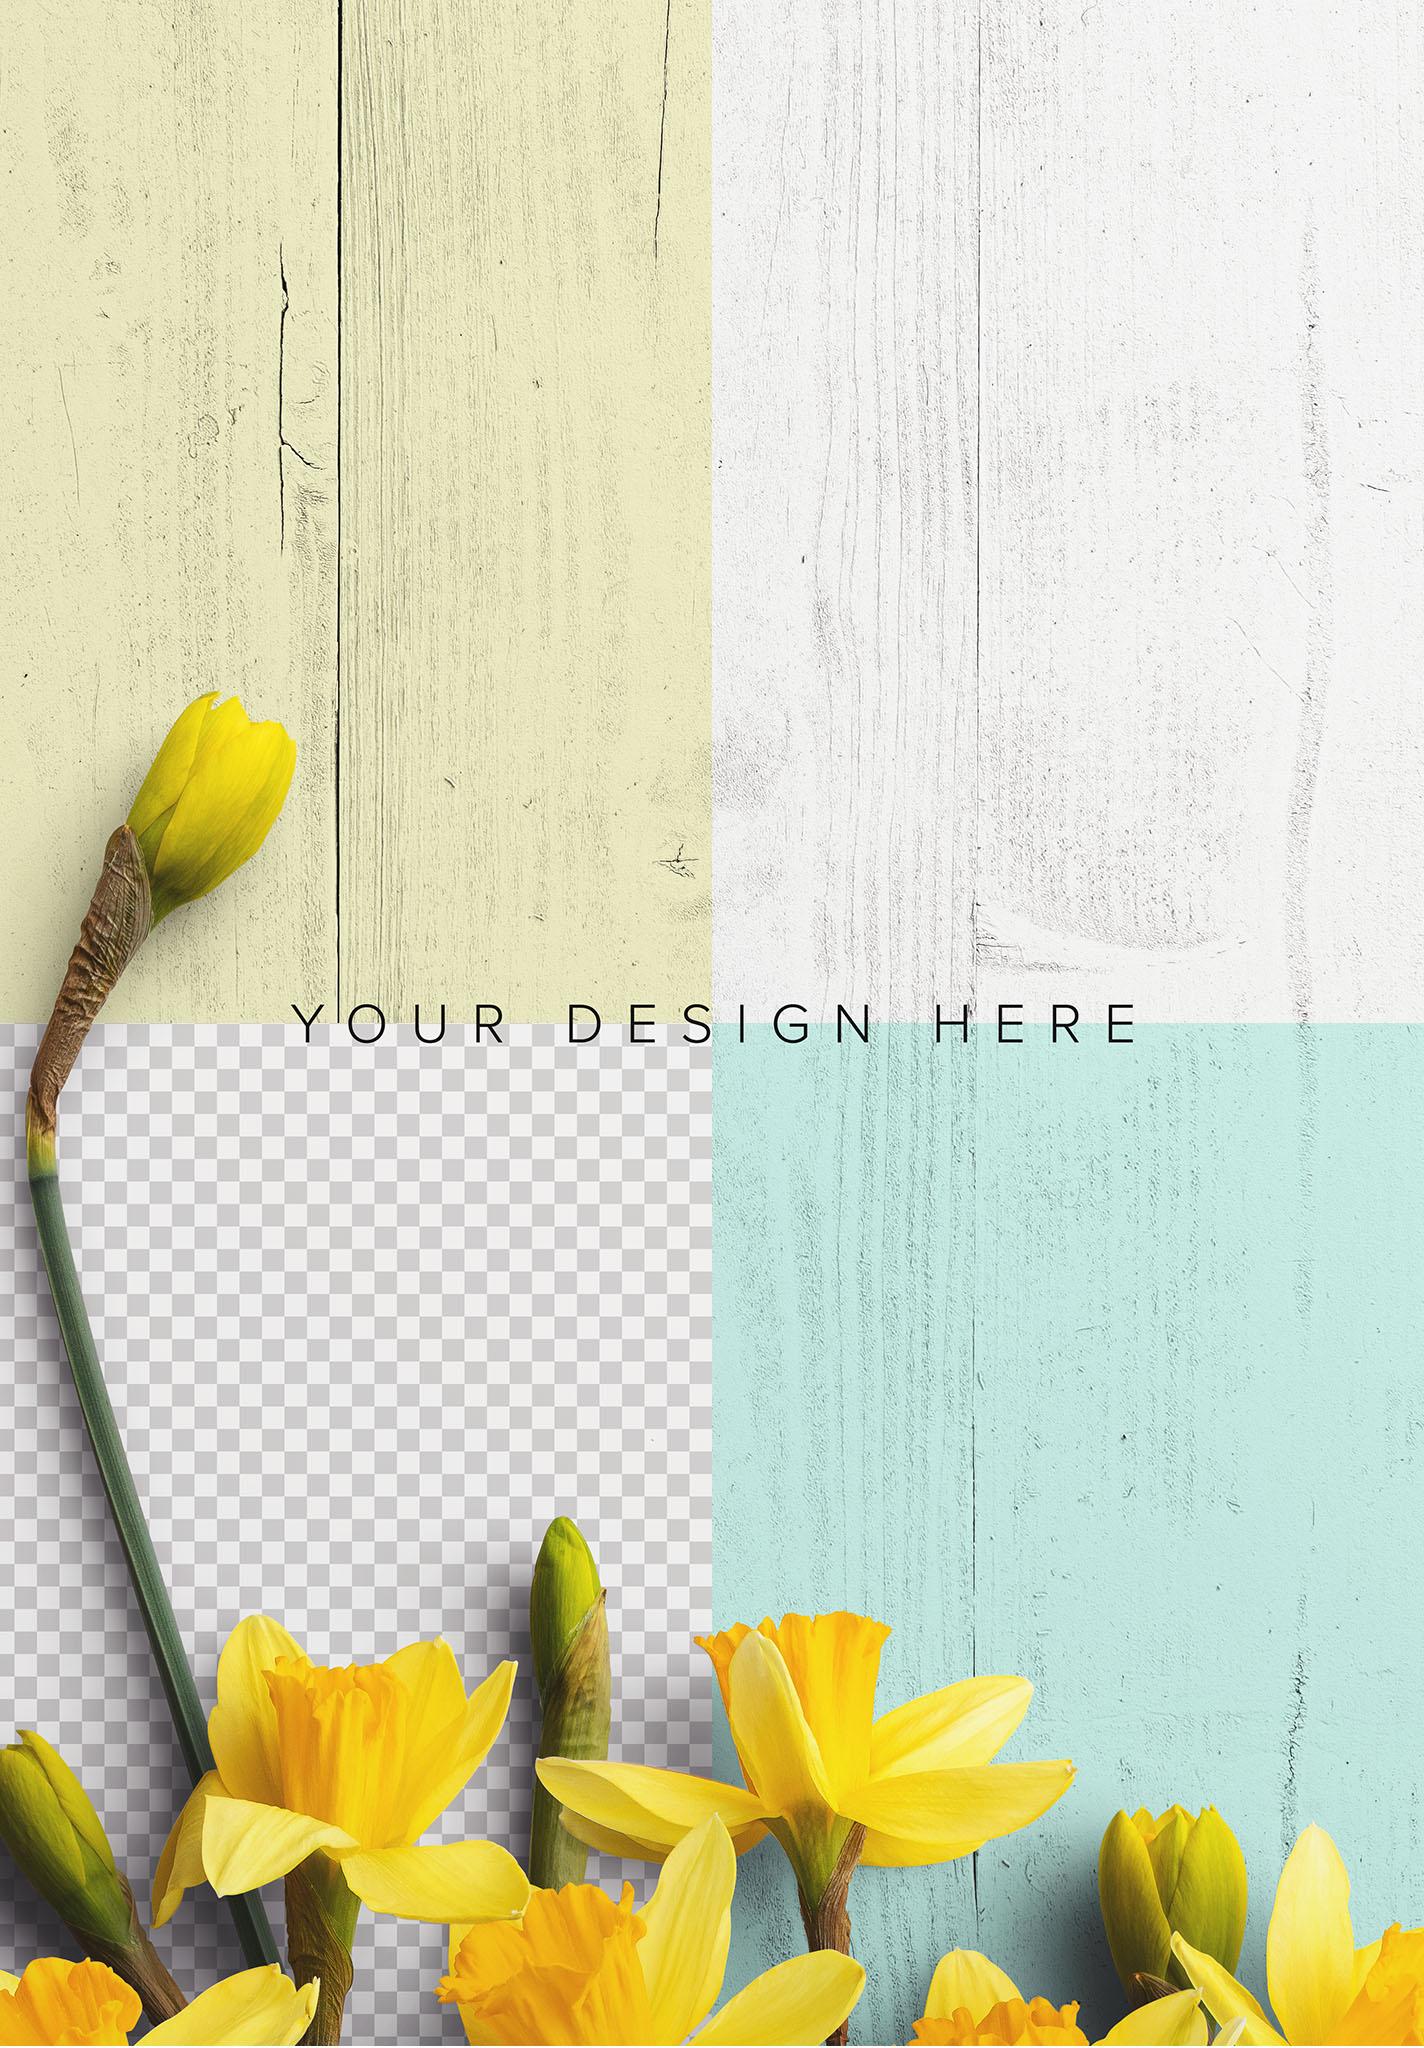 Daffodils Custom Scene Creator Template 6 Image02